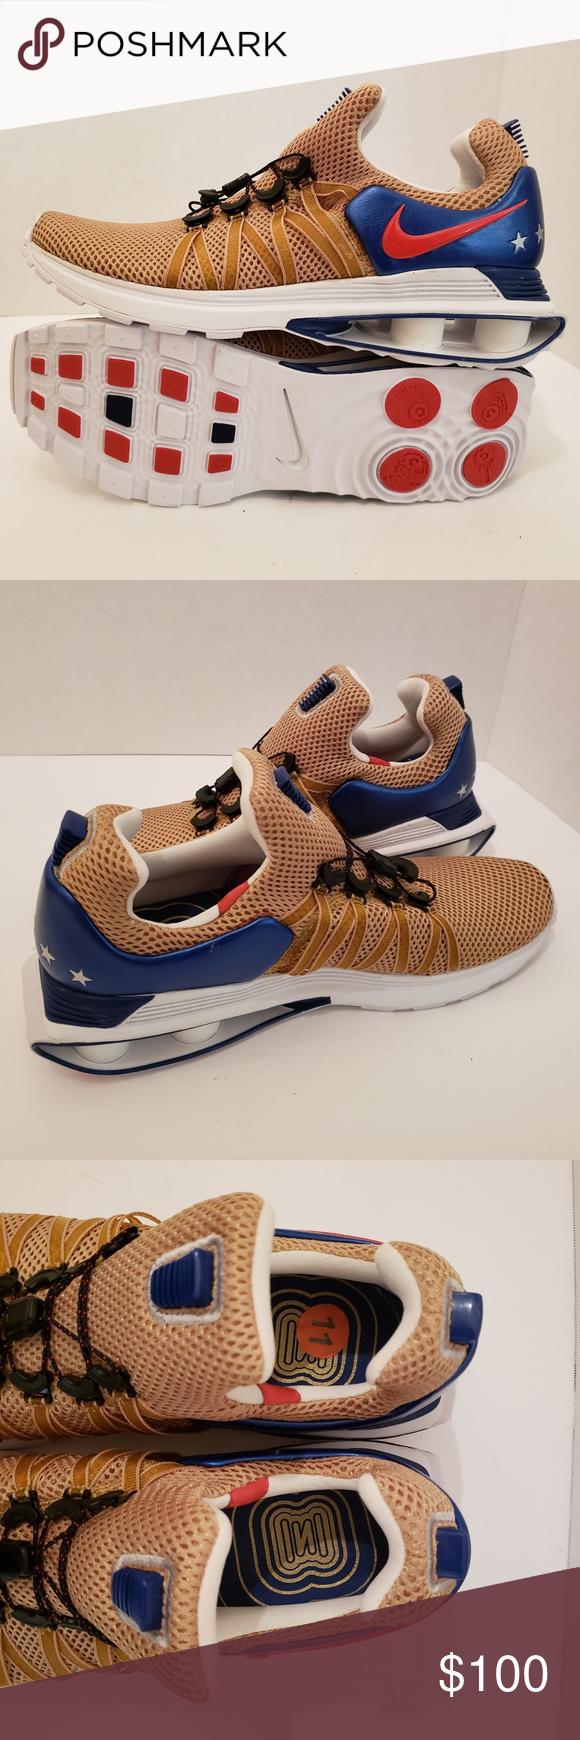 Nike Shox Gravity Mens Running Shoes Sizes 9.5 e4f879200